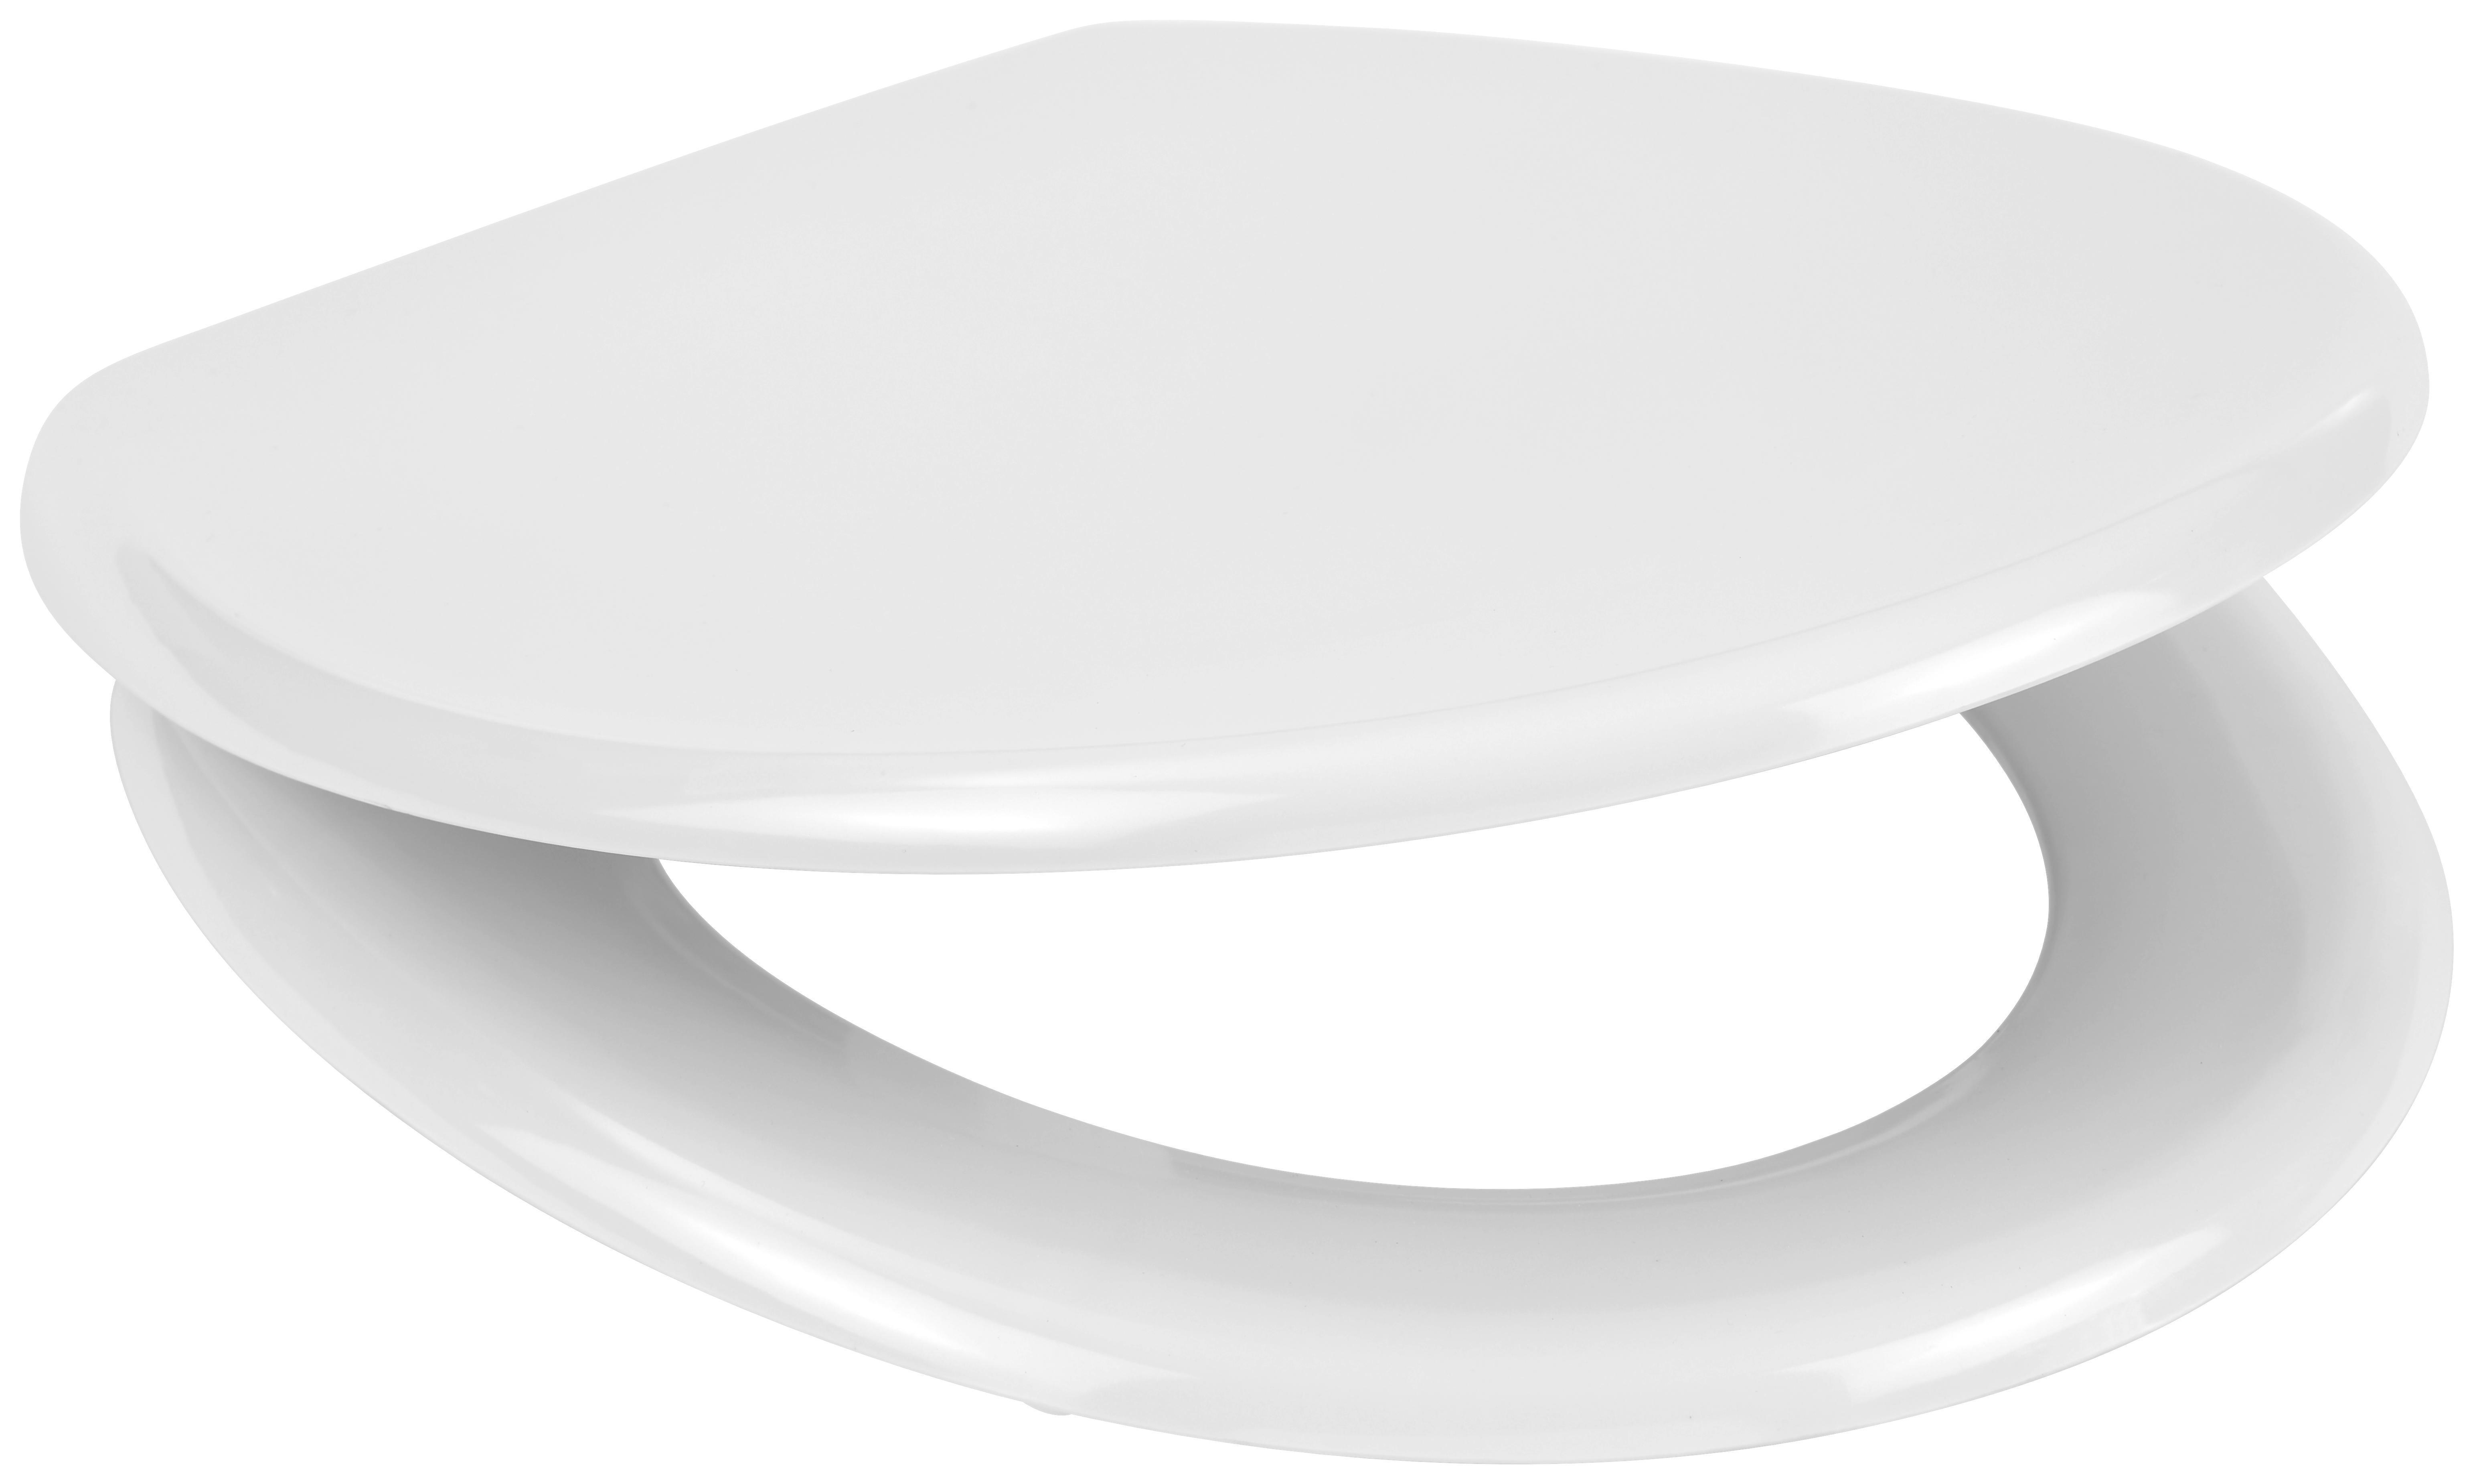 Duroplast WC Toilettendeckel Klodeckel Toilettensitz Absenkautomatik London Str.